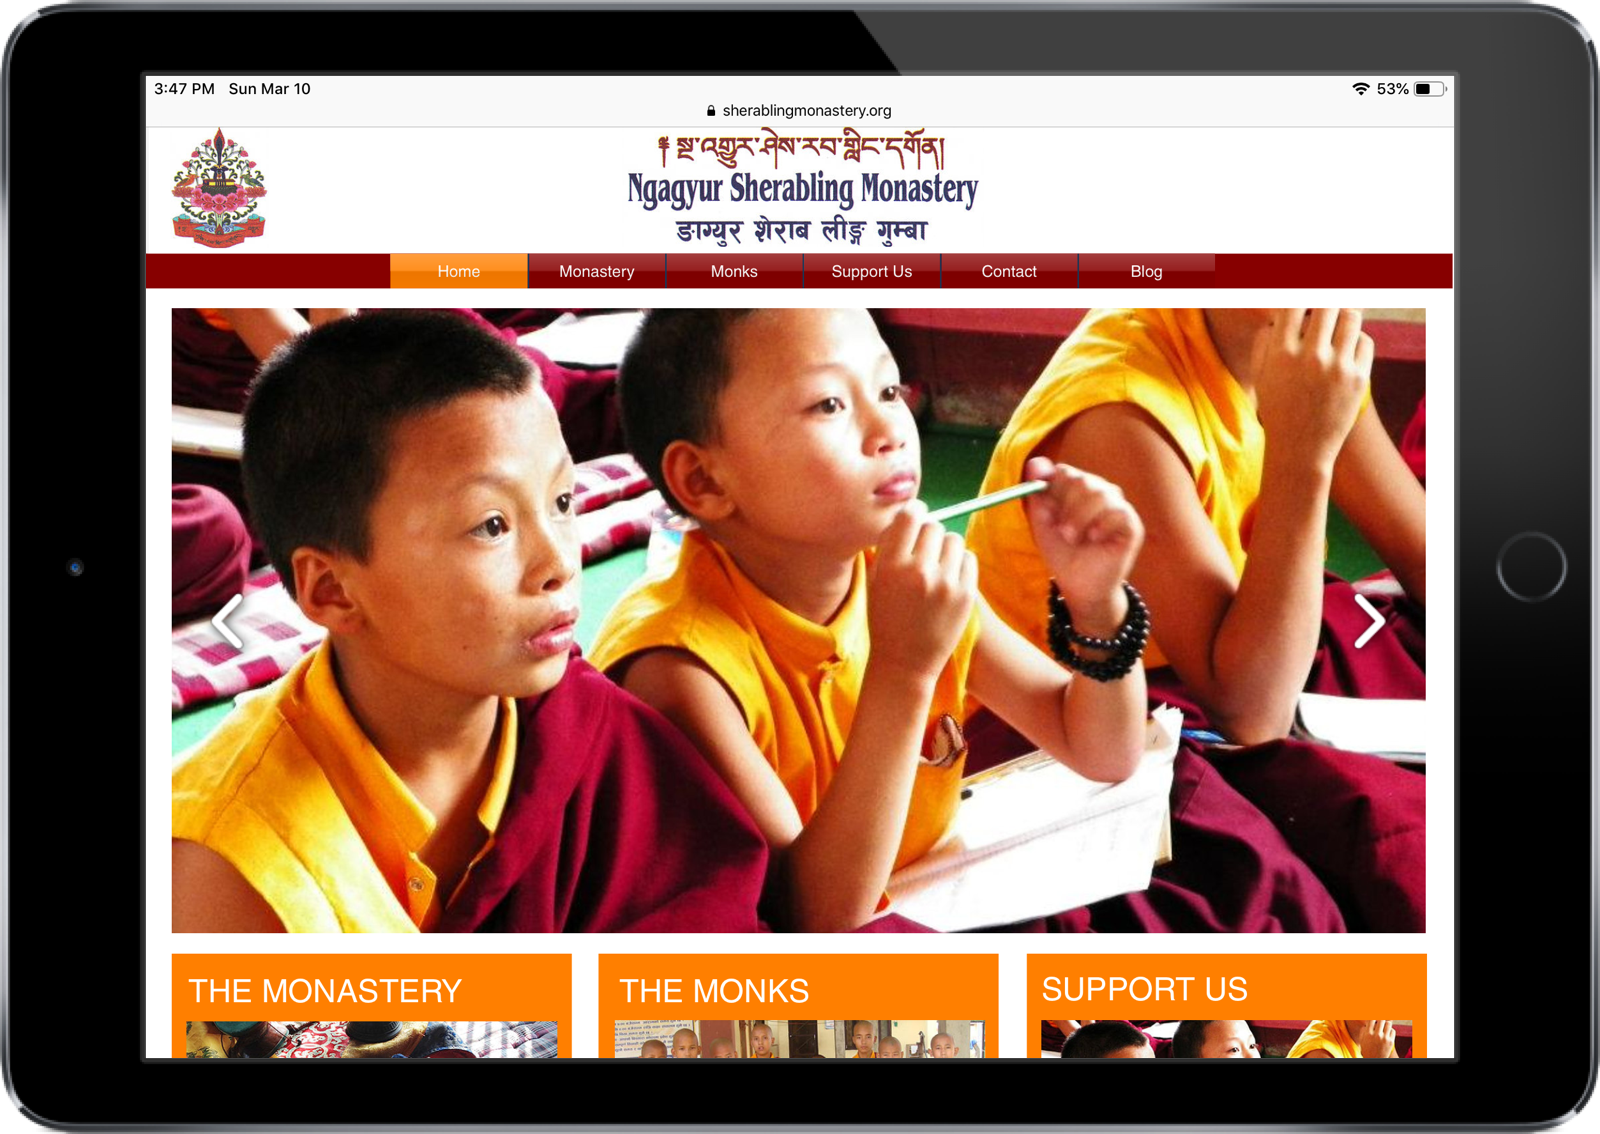 Sherabling Buddhist Monastery in Nepal website